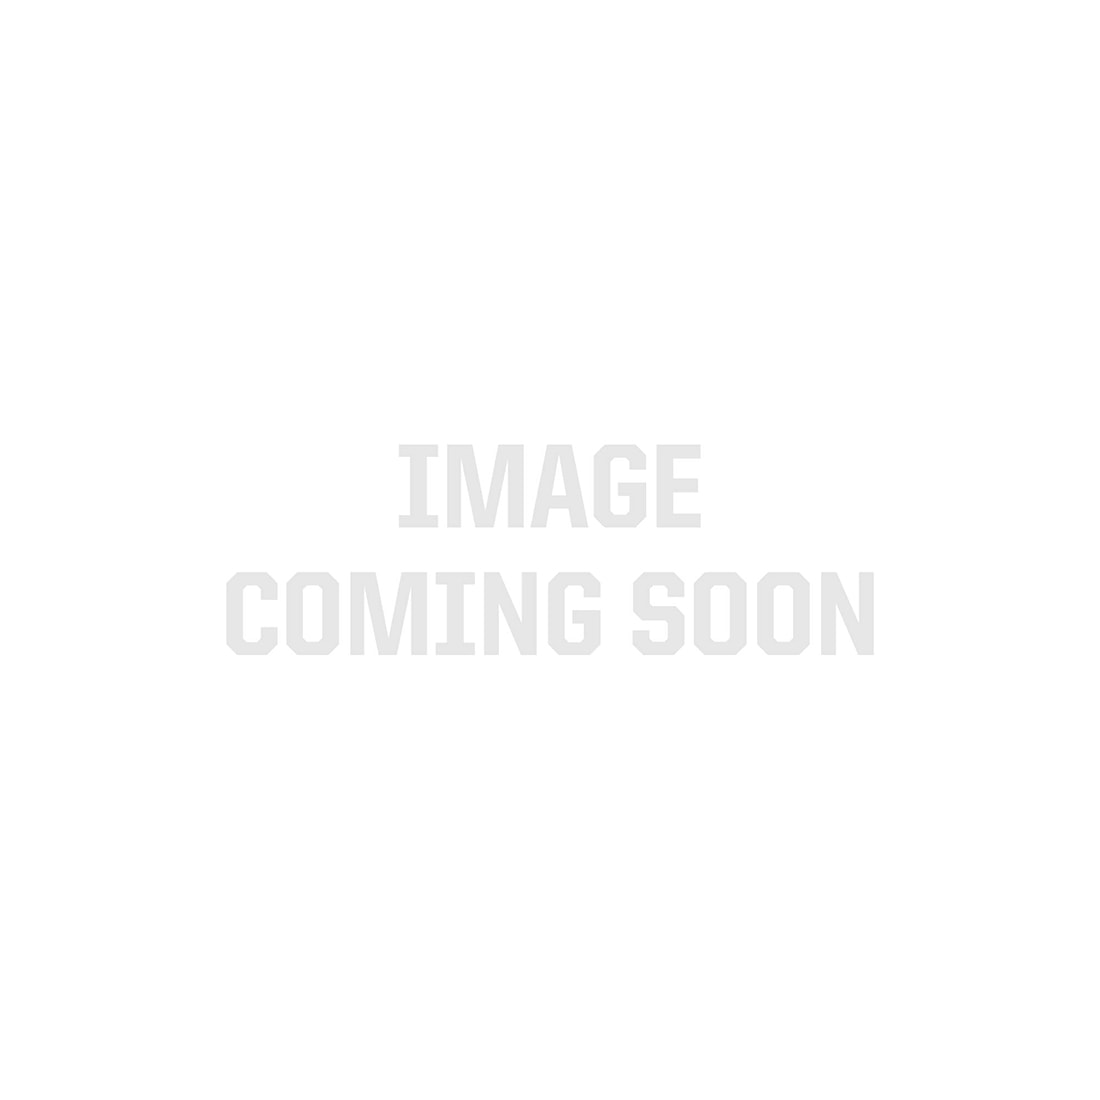 MicroMax VLB LED Driver - 24VDC - 260W